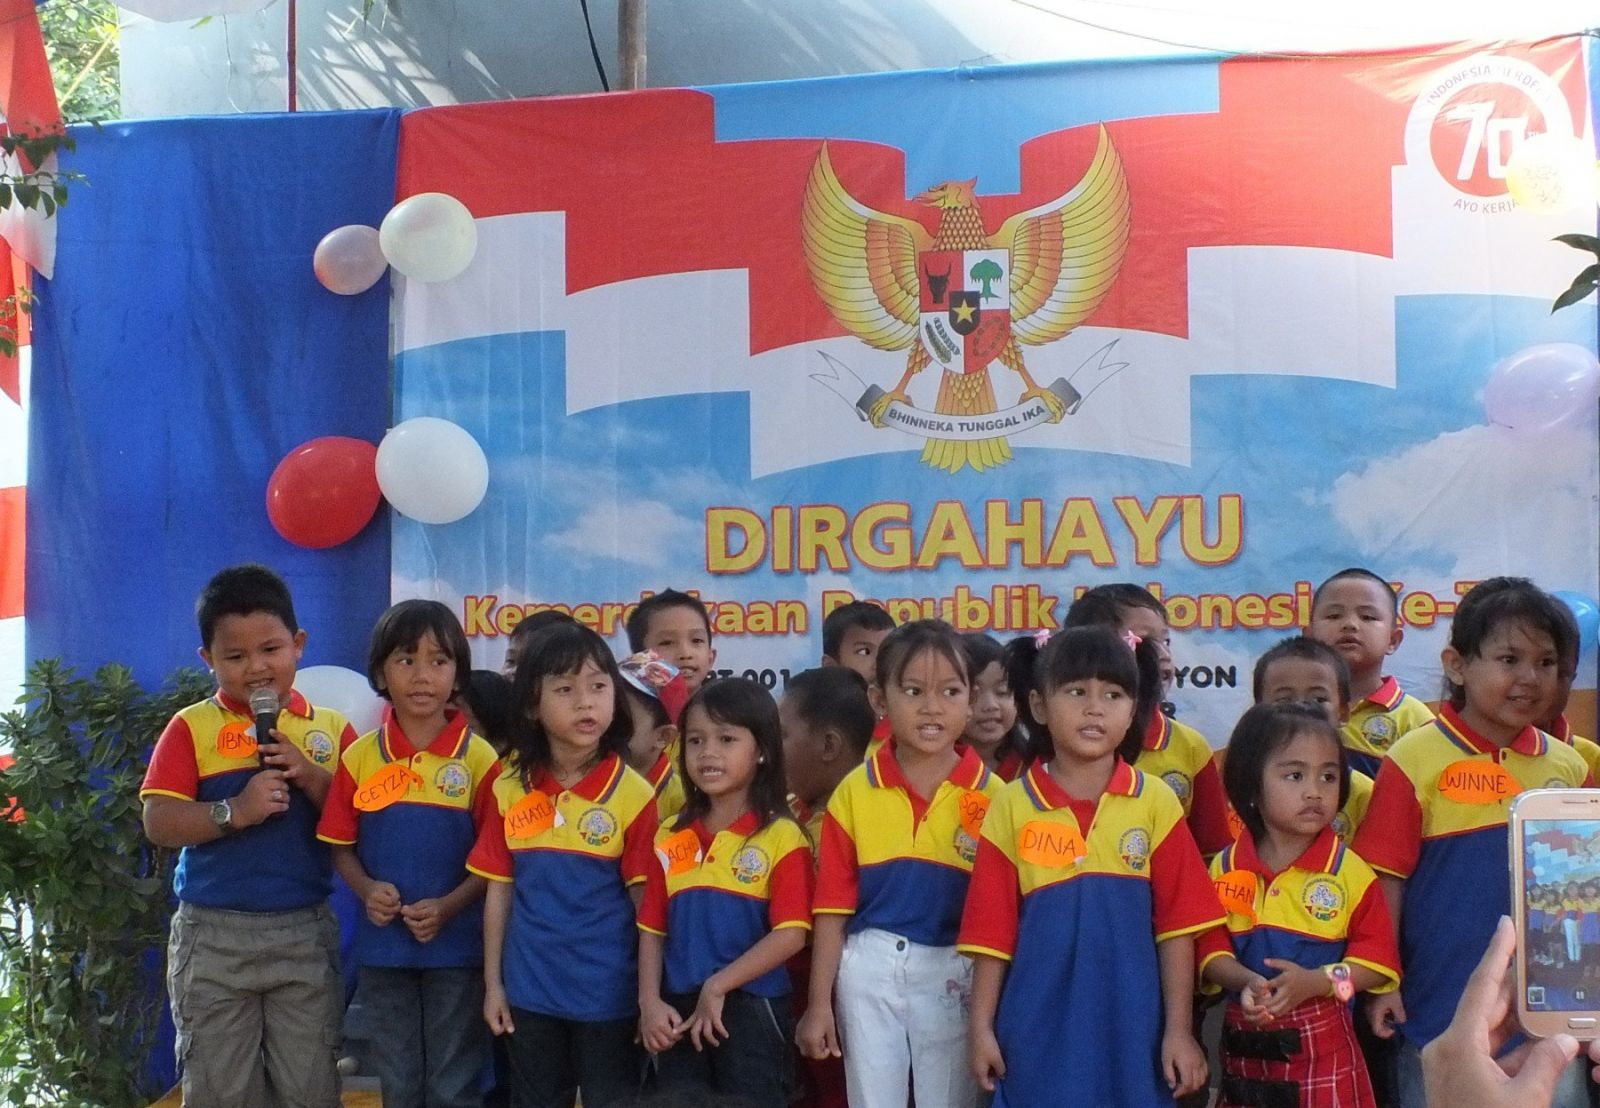 Anak-anak biMBA menyanyikan lagu Hari Merdeka